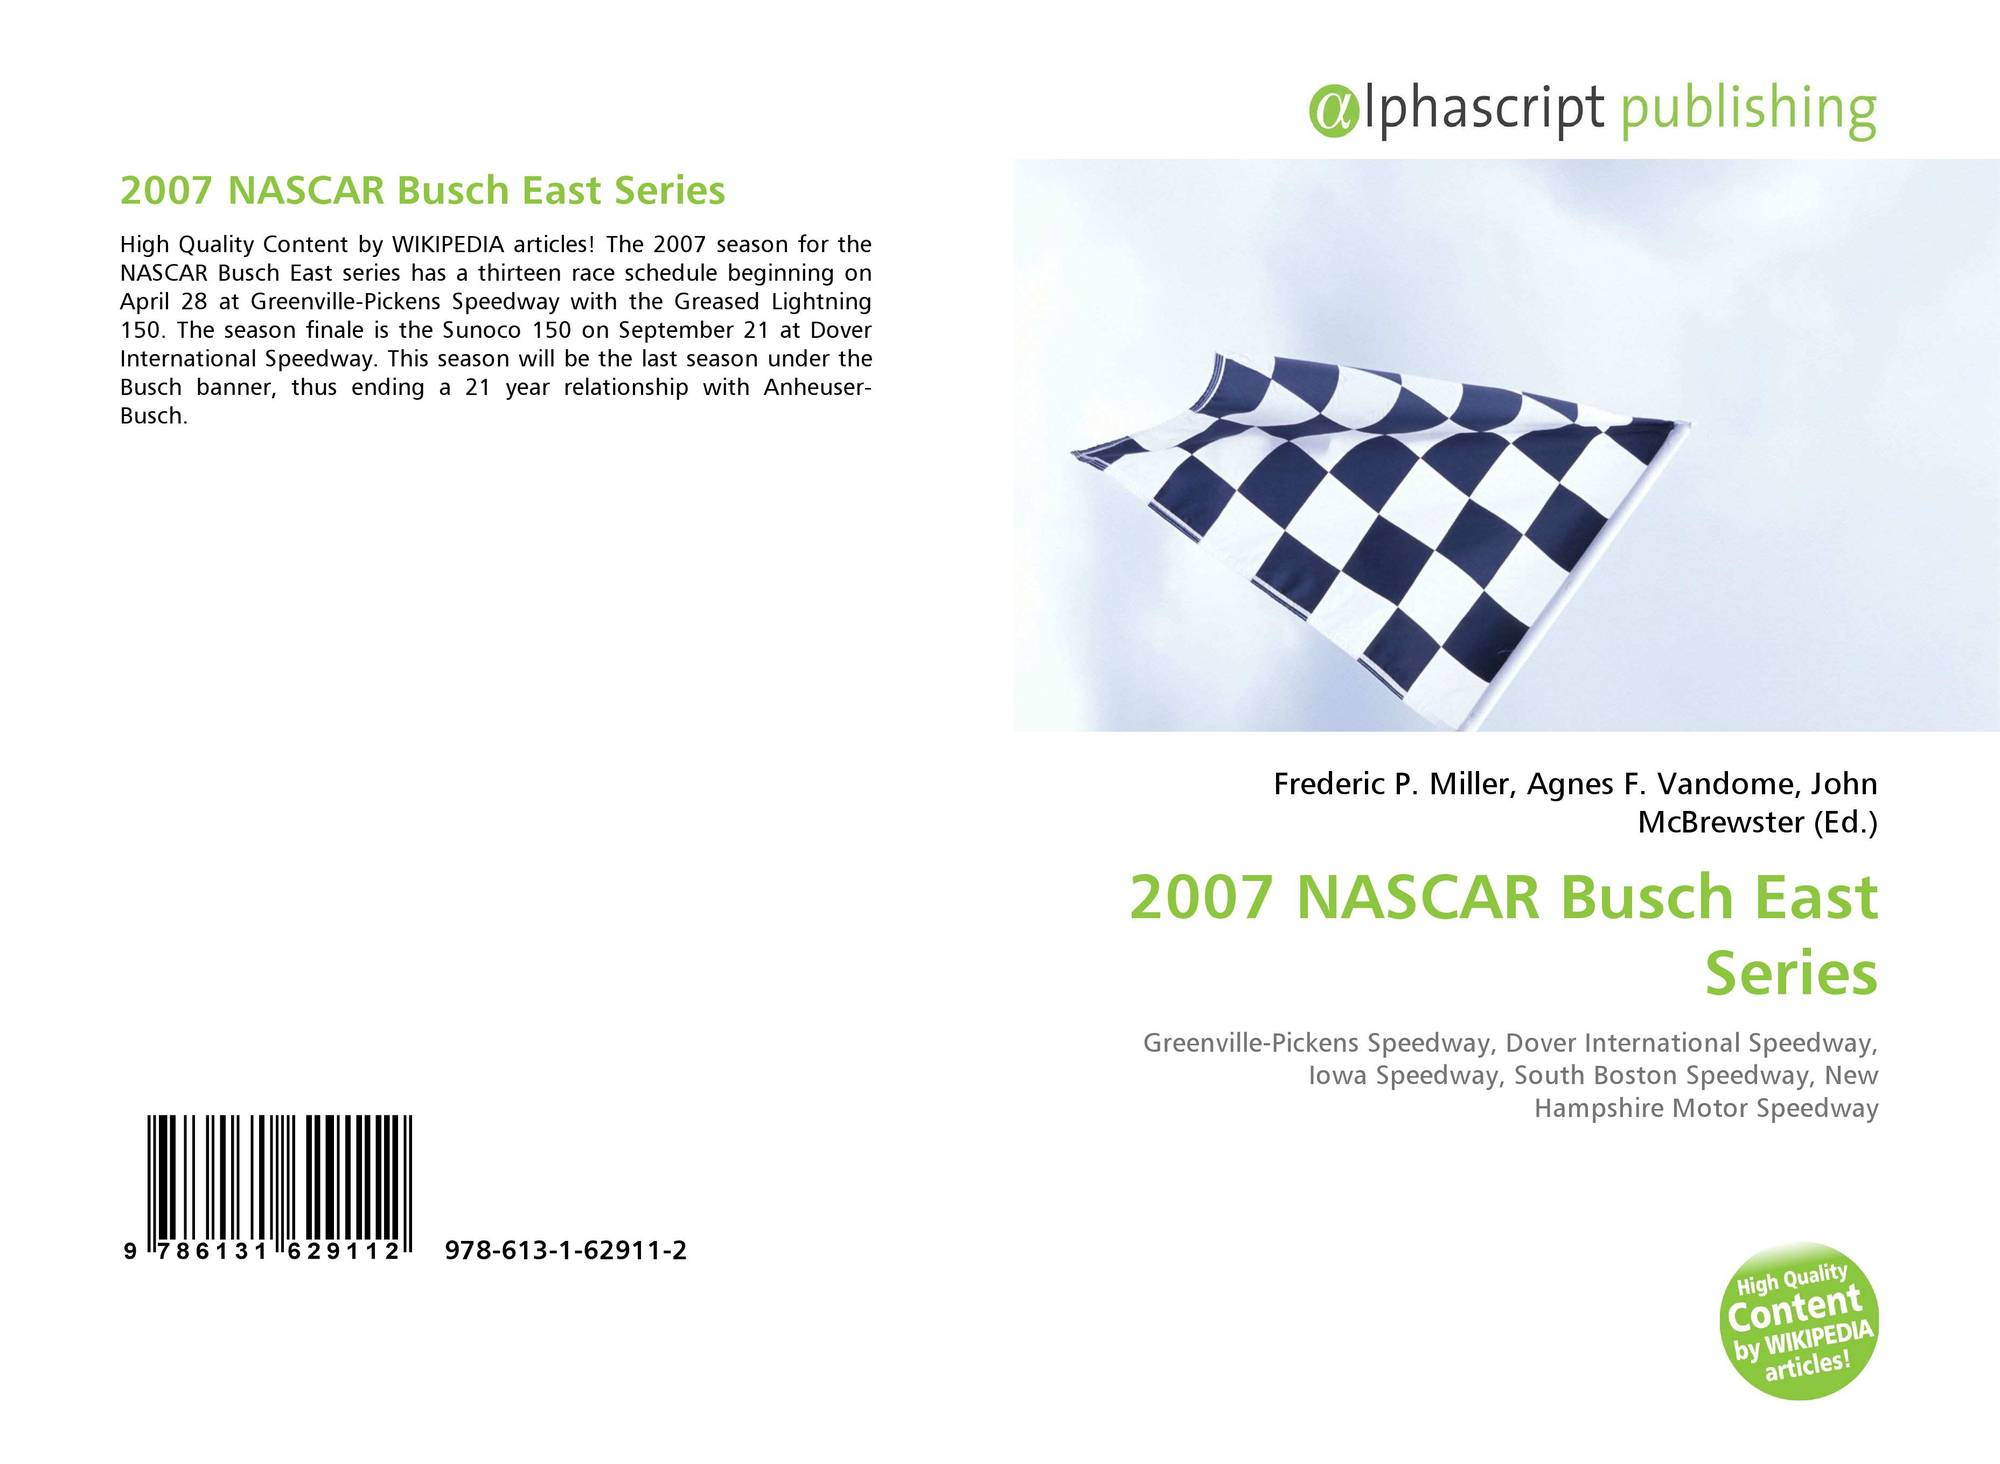 2007 NASCAR Busch East Series 978 613 1 62911 2 6131629110